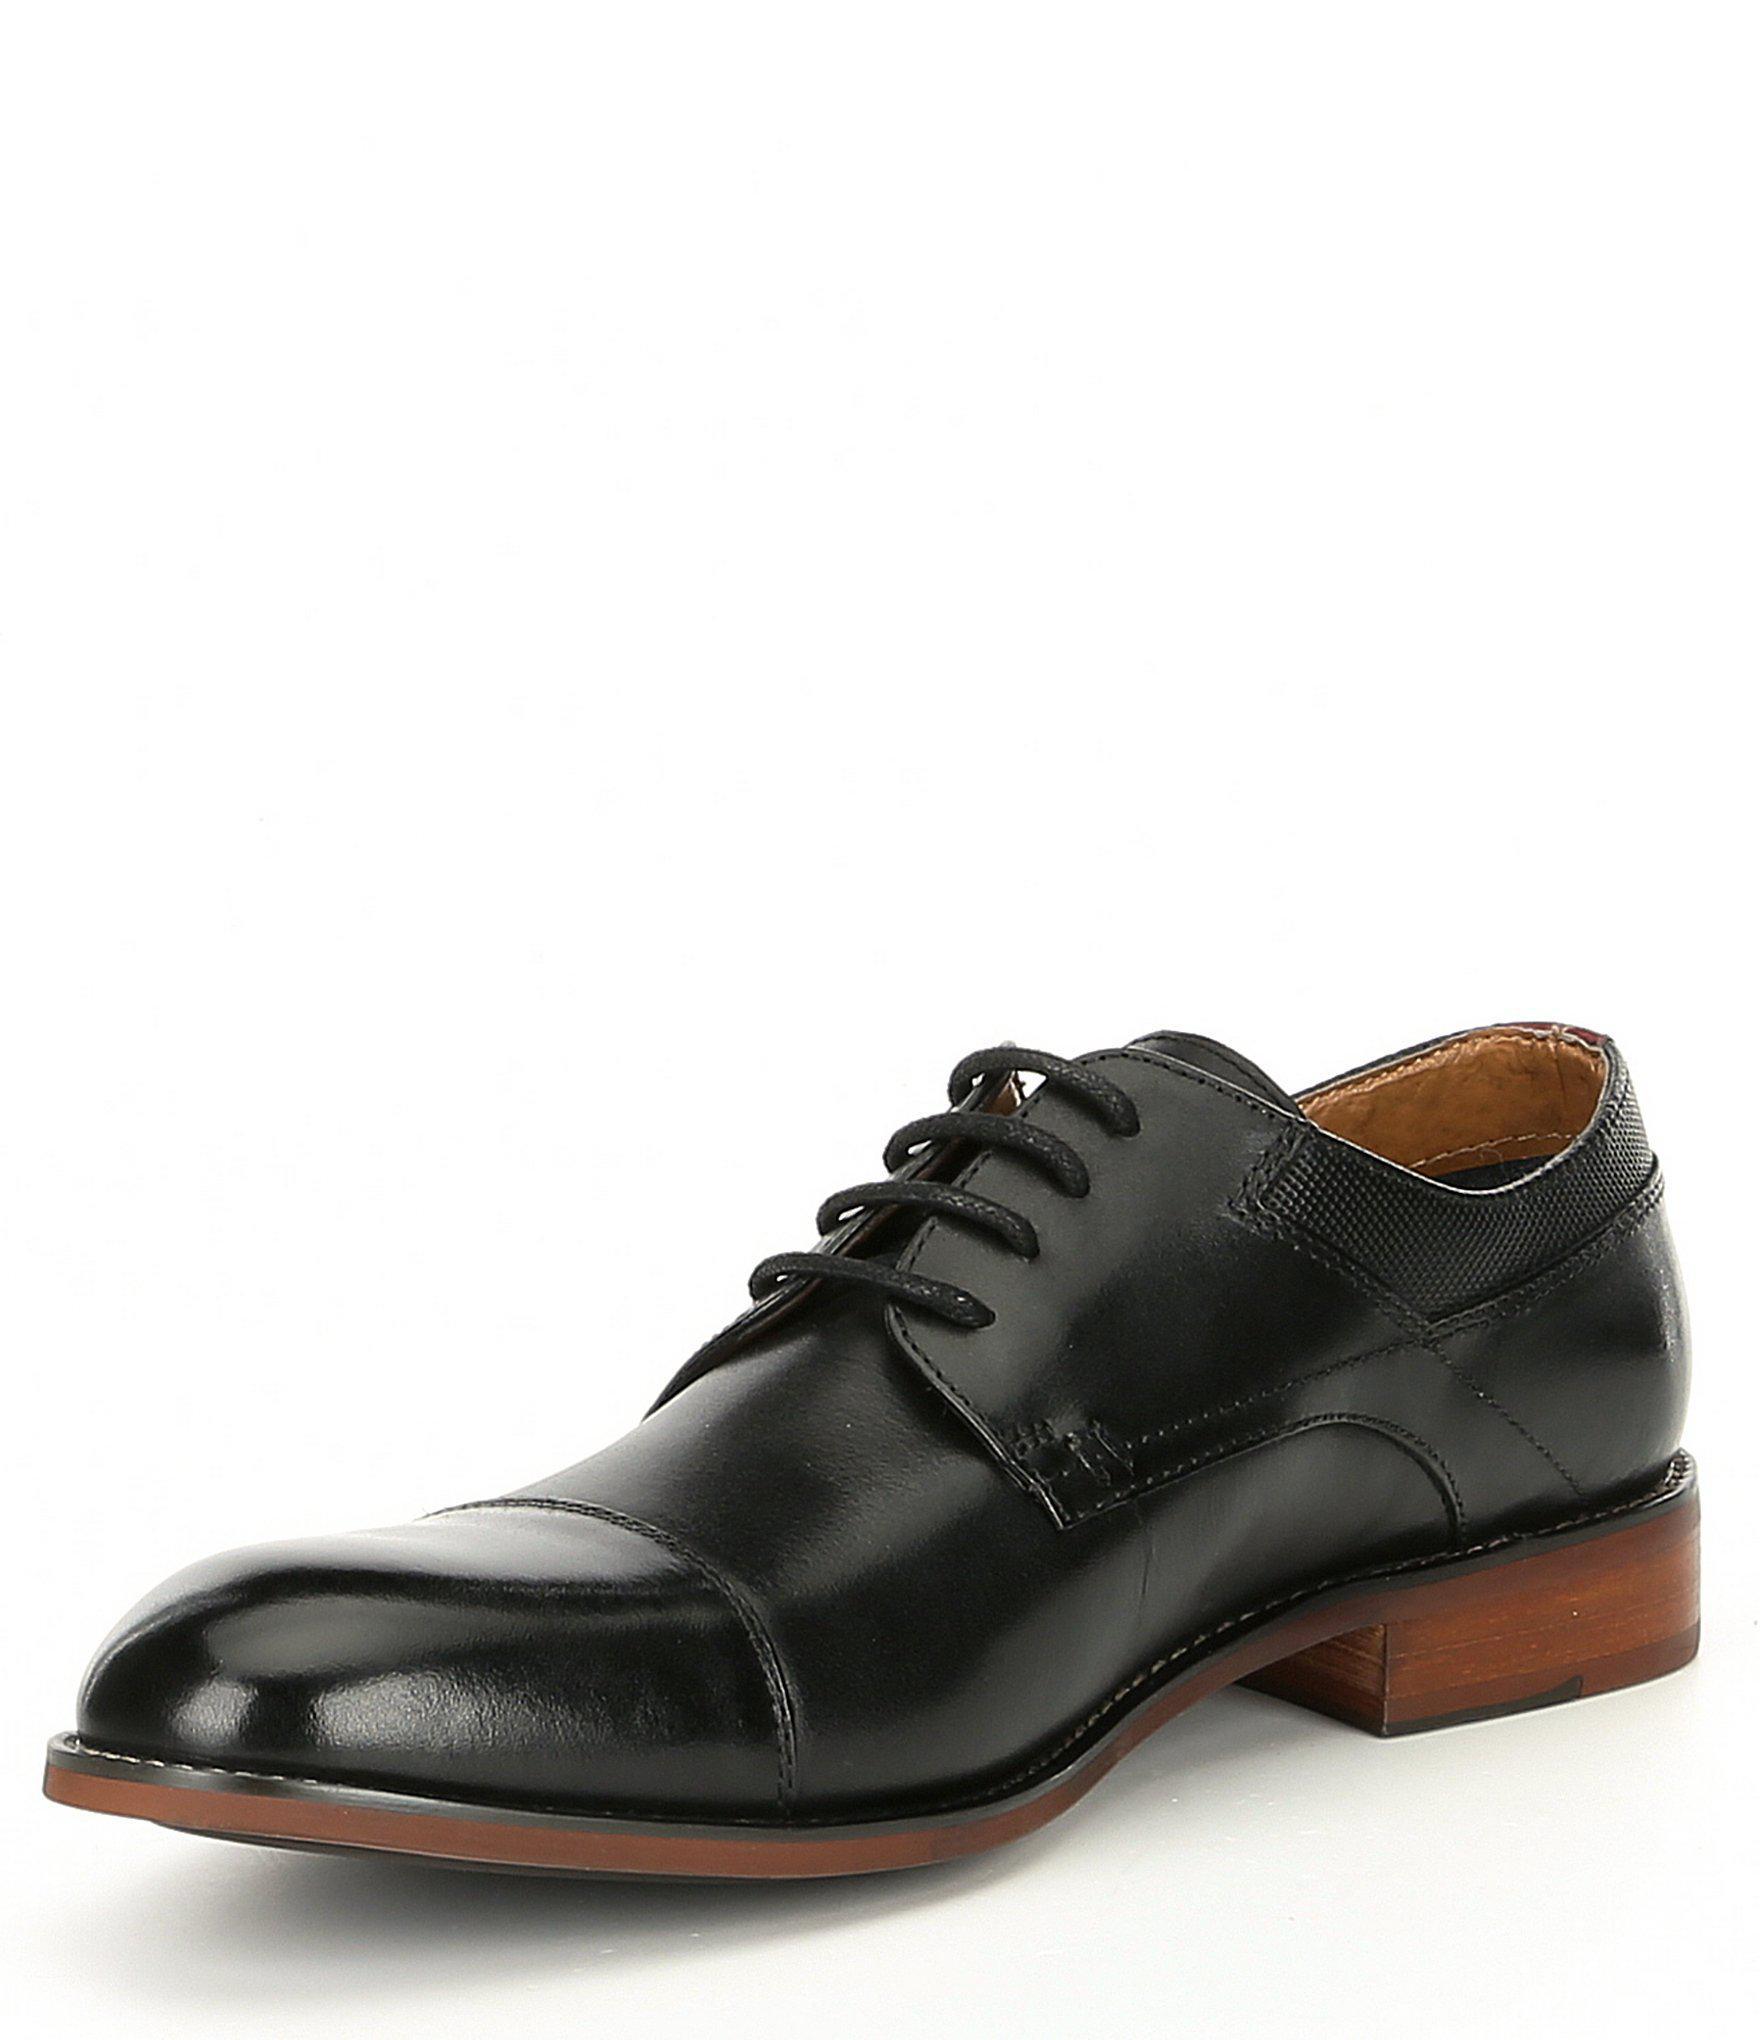 a3f194c26f8 Steve Madden - Black Men s Lorance Leather Cap Toe Oxford for Men - Lyst.  View fullscreen